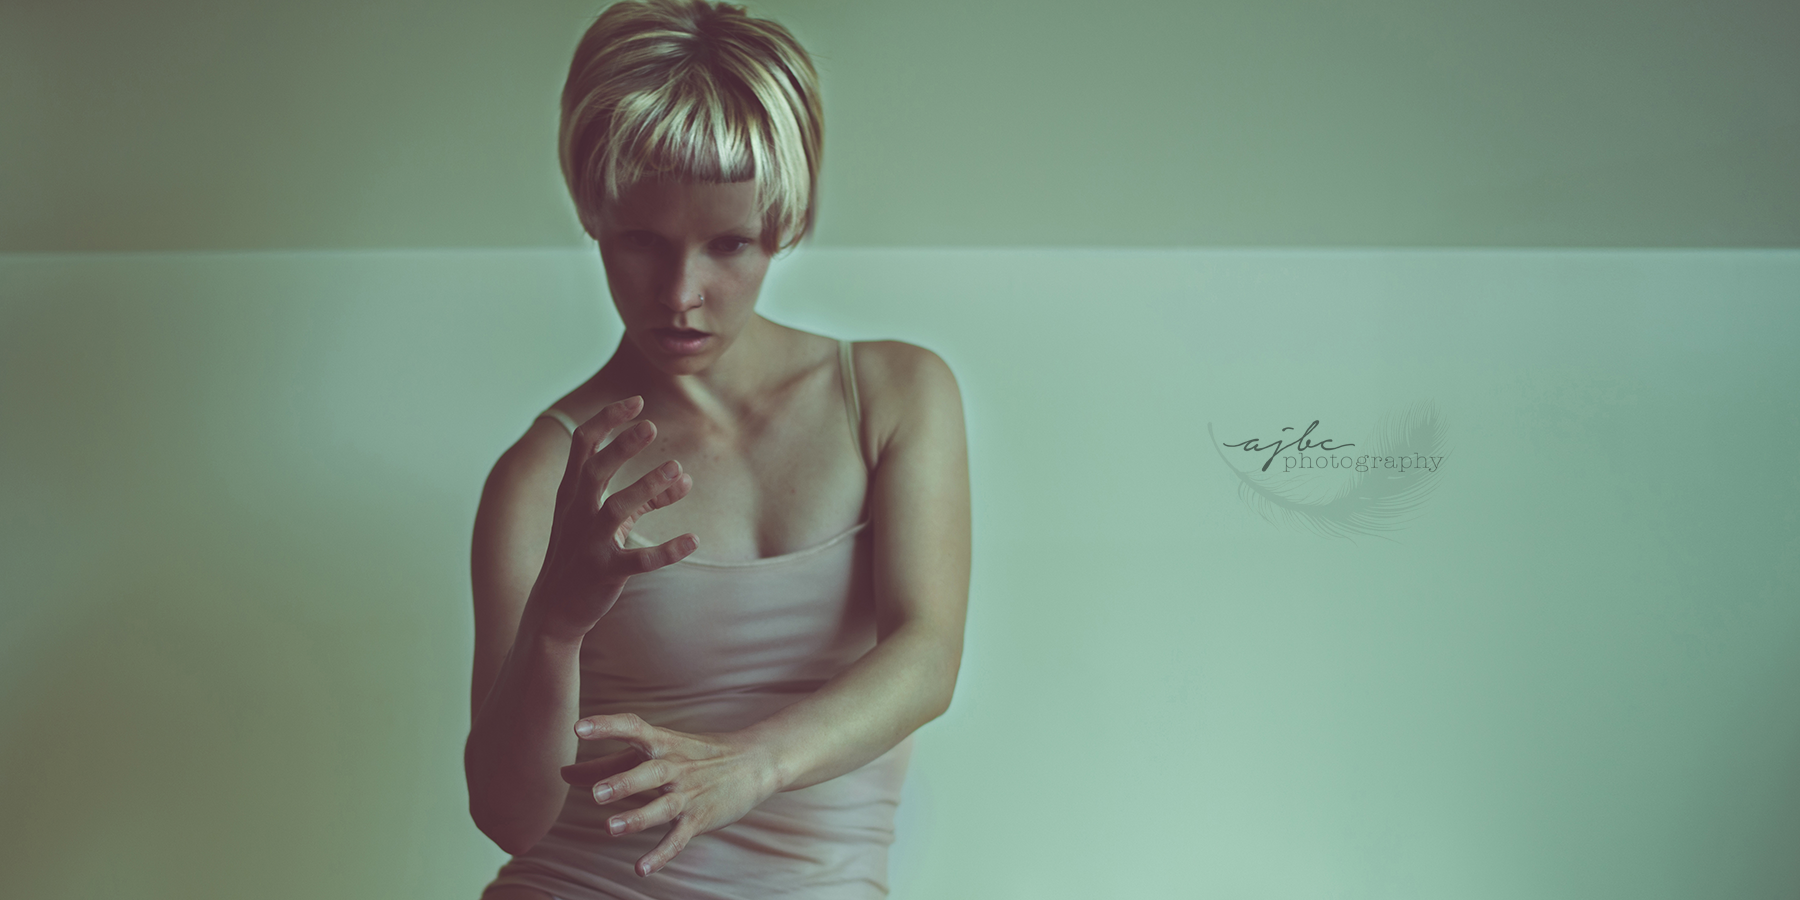 Sia Chandelier Art Port Huron Photographer studio.png